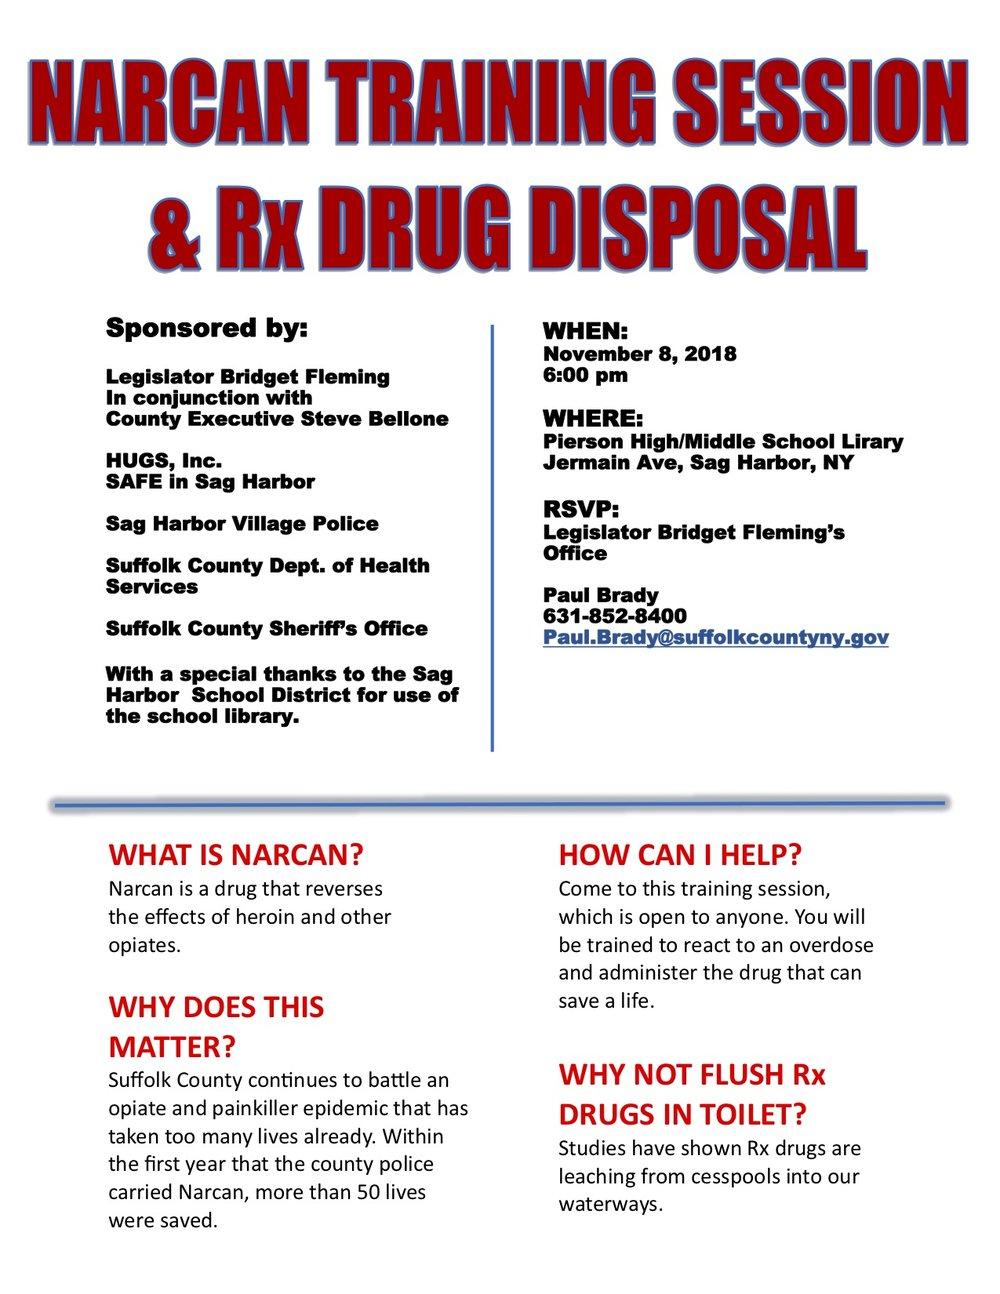 narcan poster.jpg